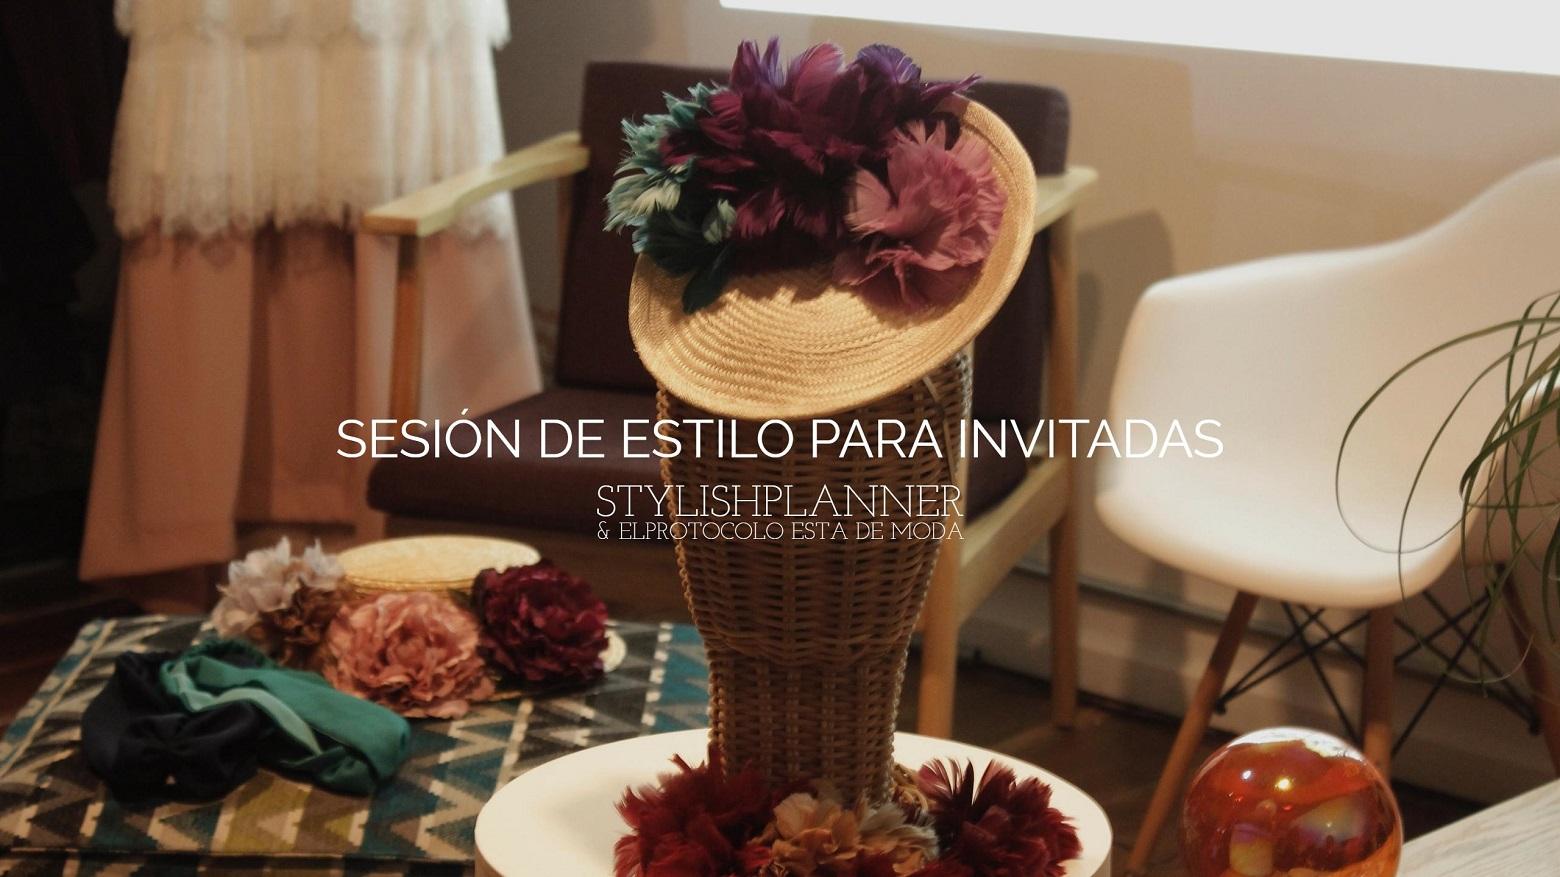 Sesion de estilo DF : La invitada Perfecta